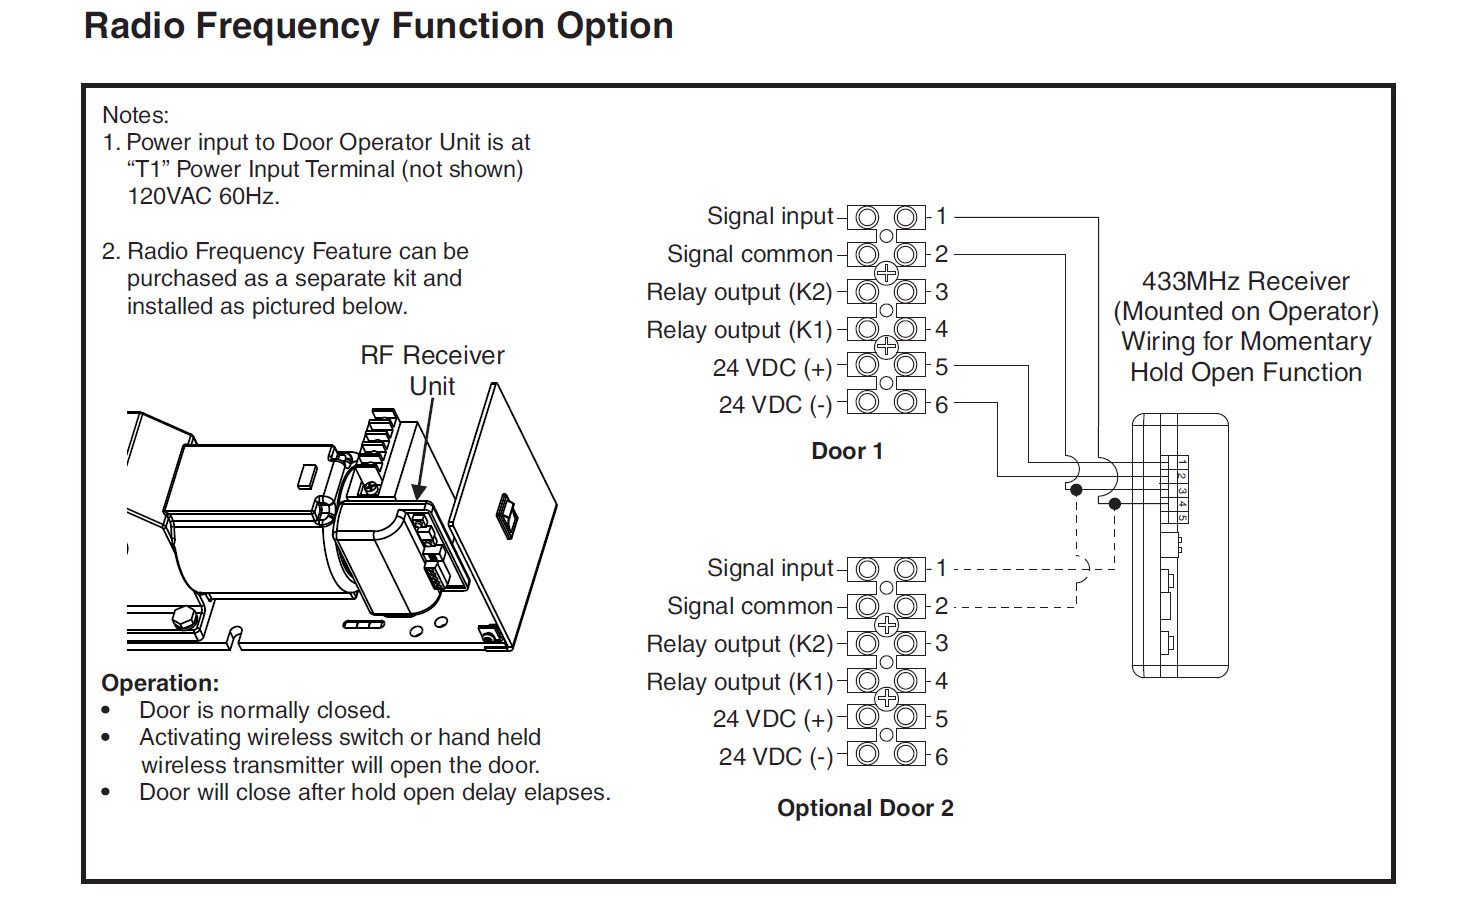 Bea Maglock Wiring Diagram - Access Control Wire Diagram -  bobcate-s70.ati-loro1.jeanjaures37.fr | Bea Maglock Wiring Diagram |  | Wiring Diagram Resource